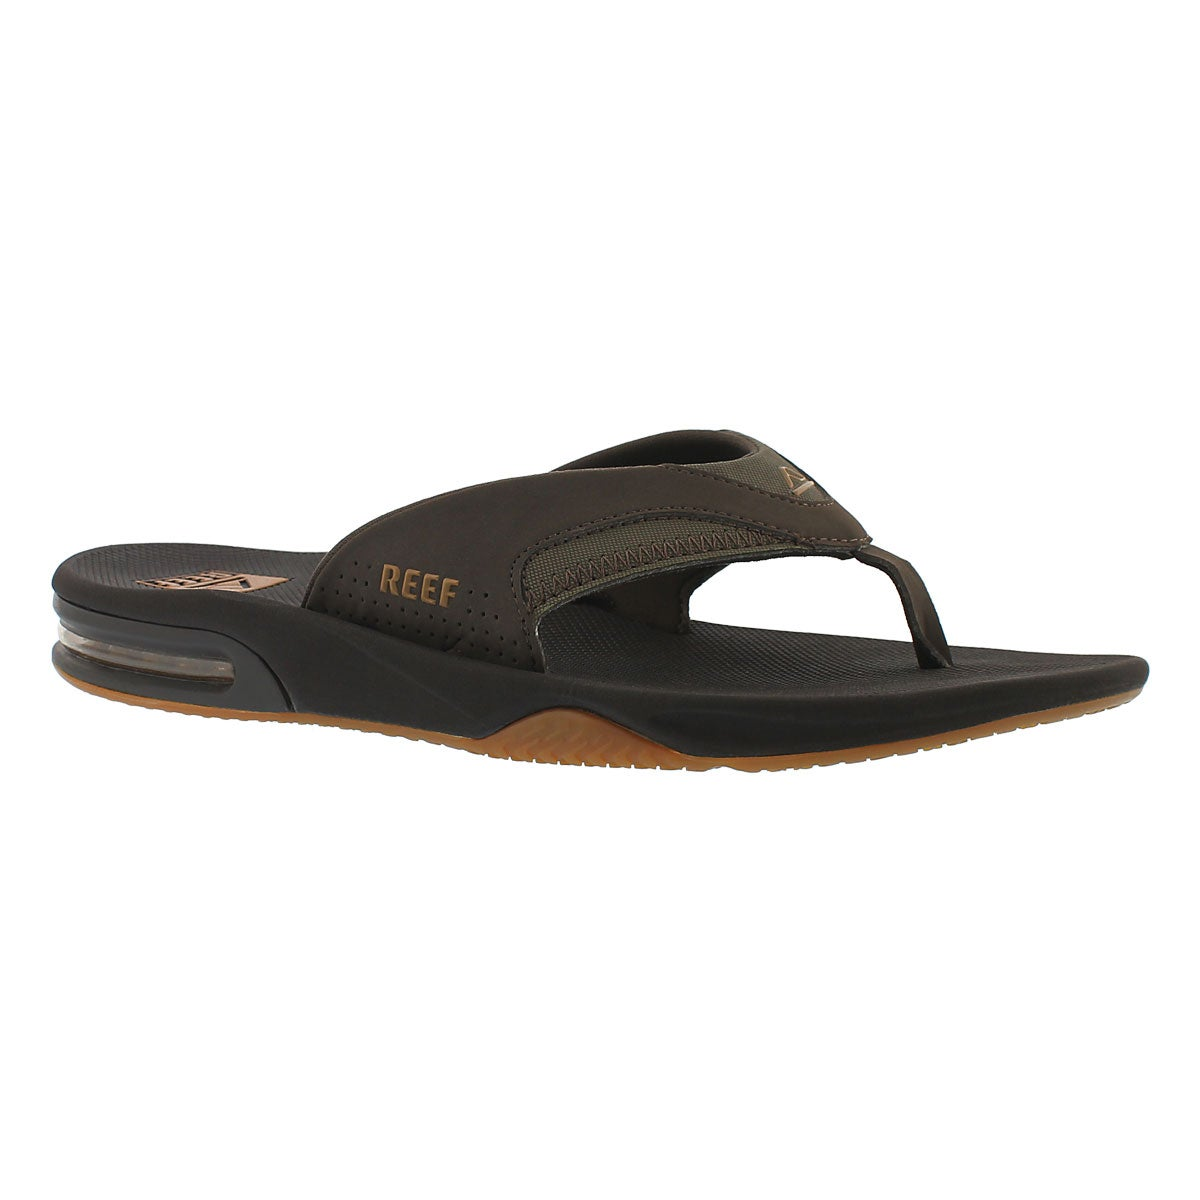 Men's FANNING brown/gum thong sandals